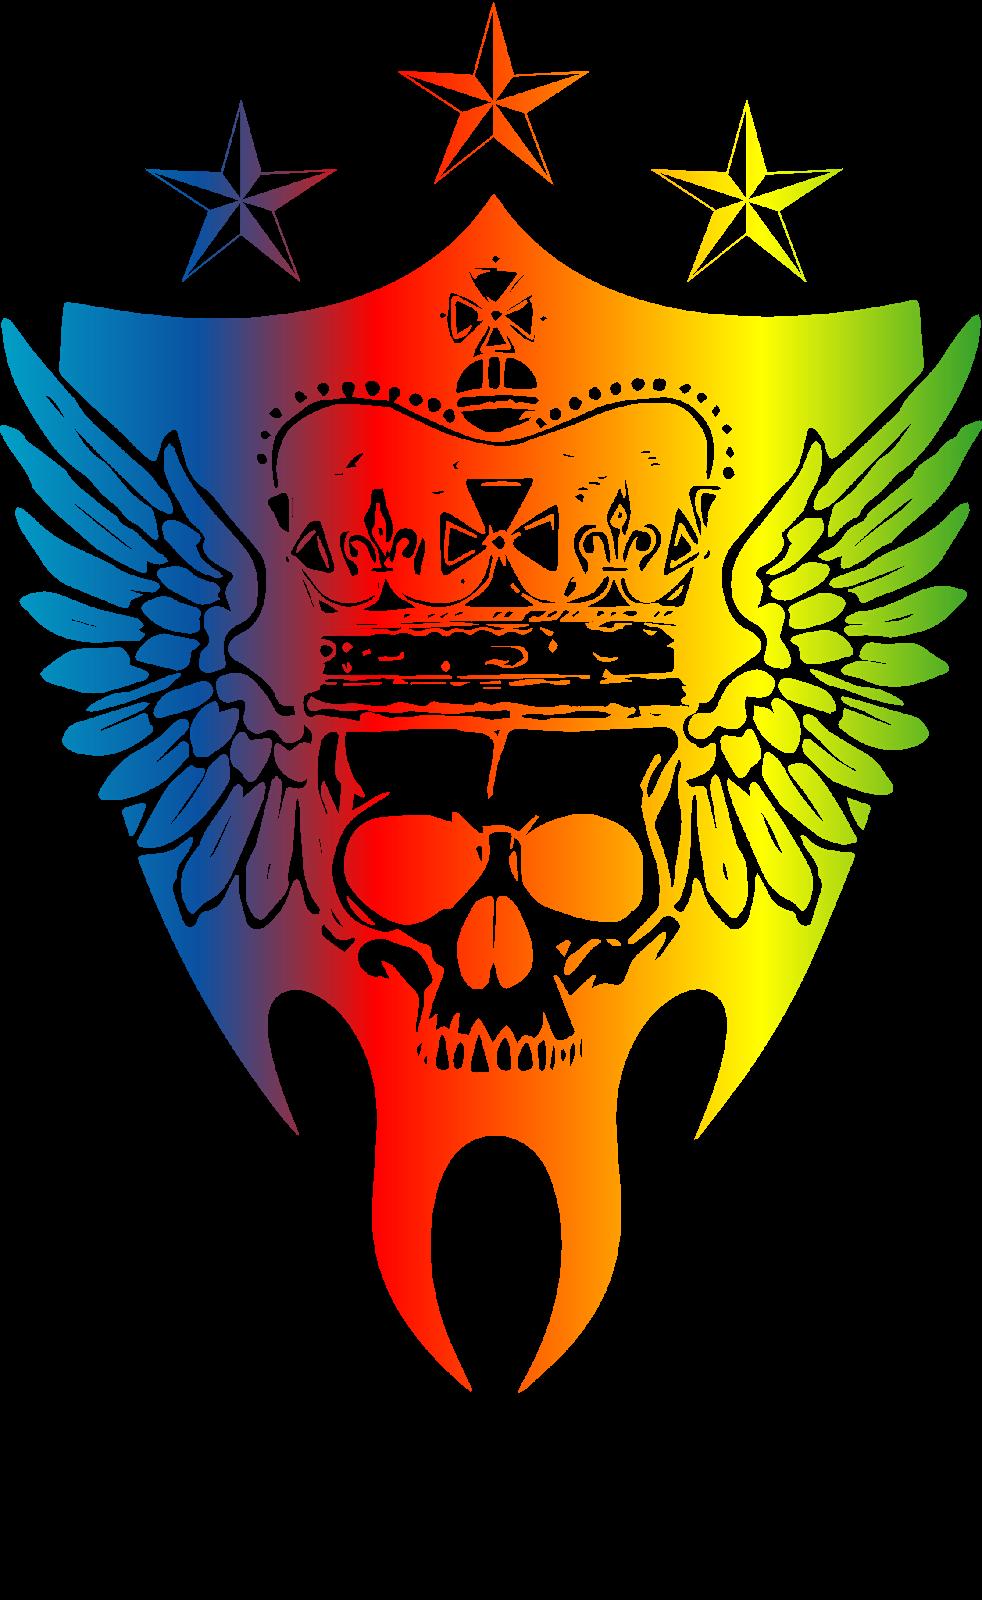 Logodol 全てが高画質 背景透過なアーティストのロゴをお届けするブログ 三代目スカルロゴ グラデーション の下にjsb表記あり